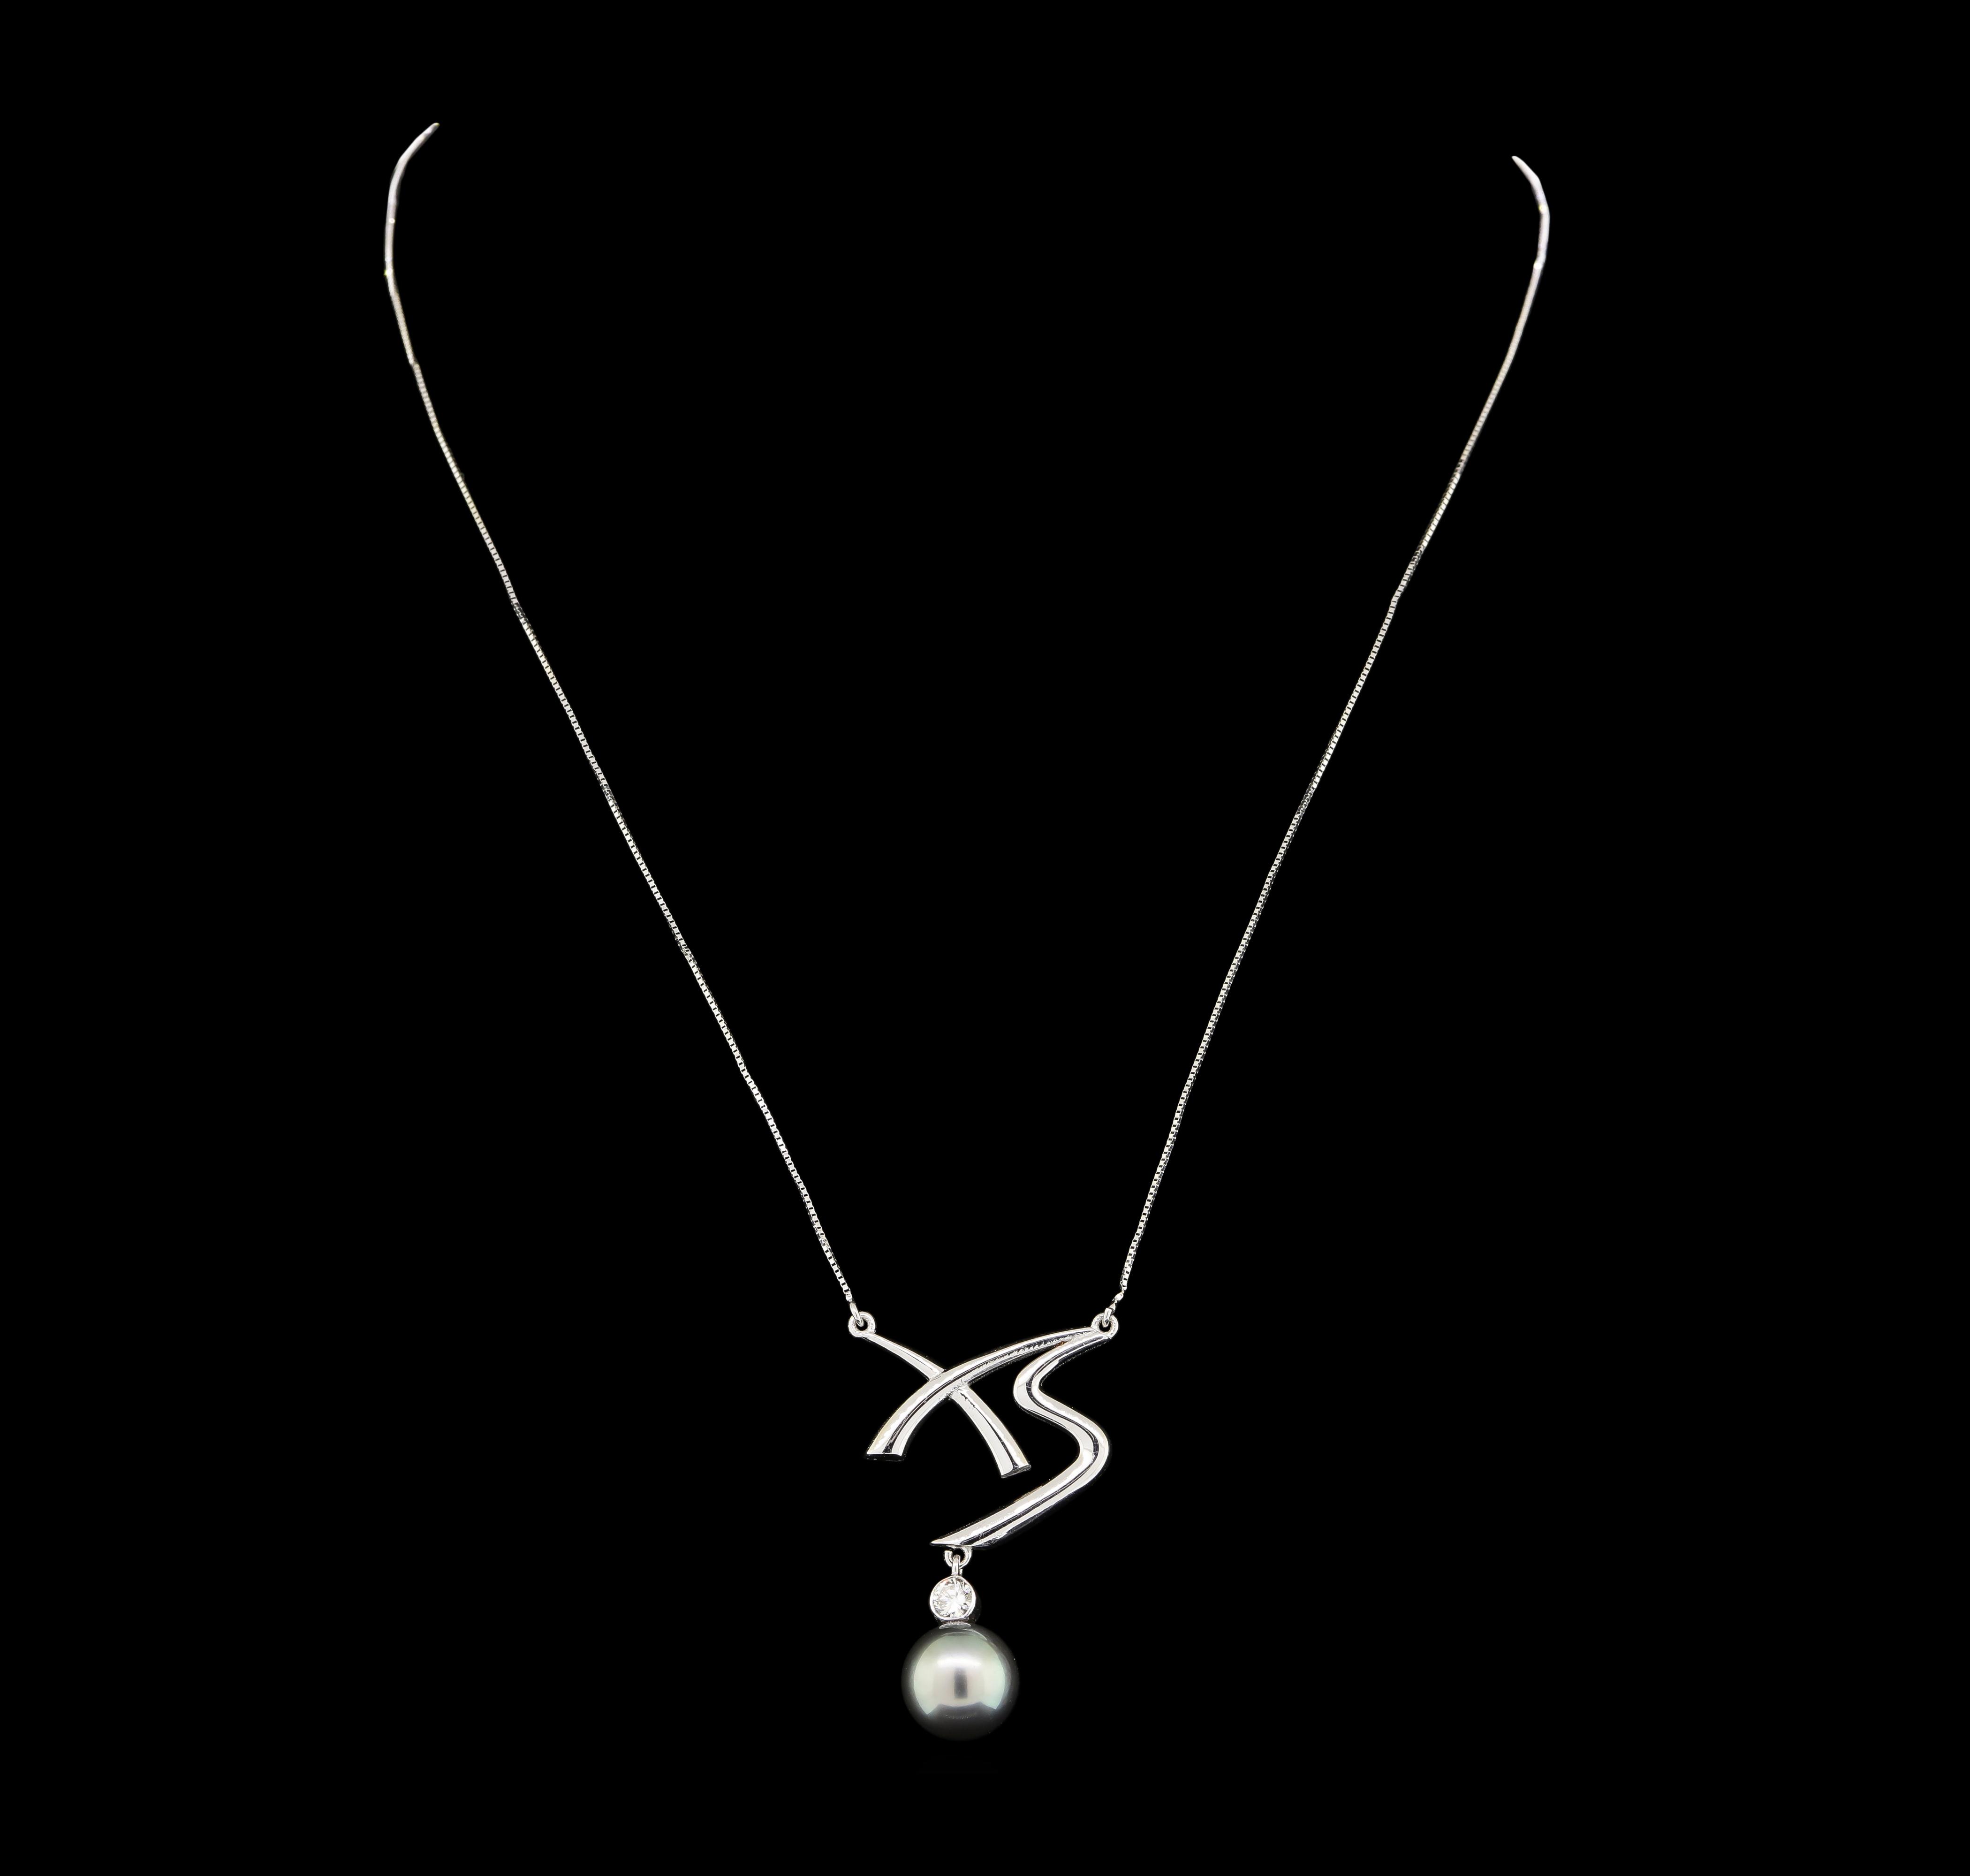 14K White Gold 7 10 Grams Black Pearl and Diamond Lady s Pendant